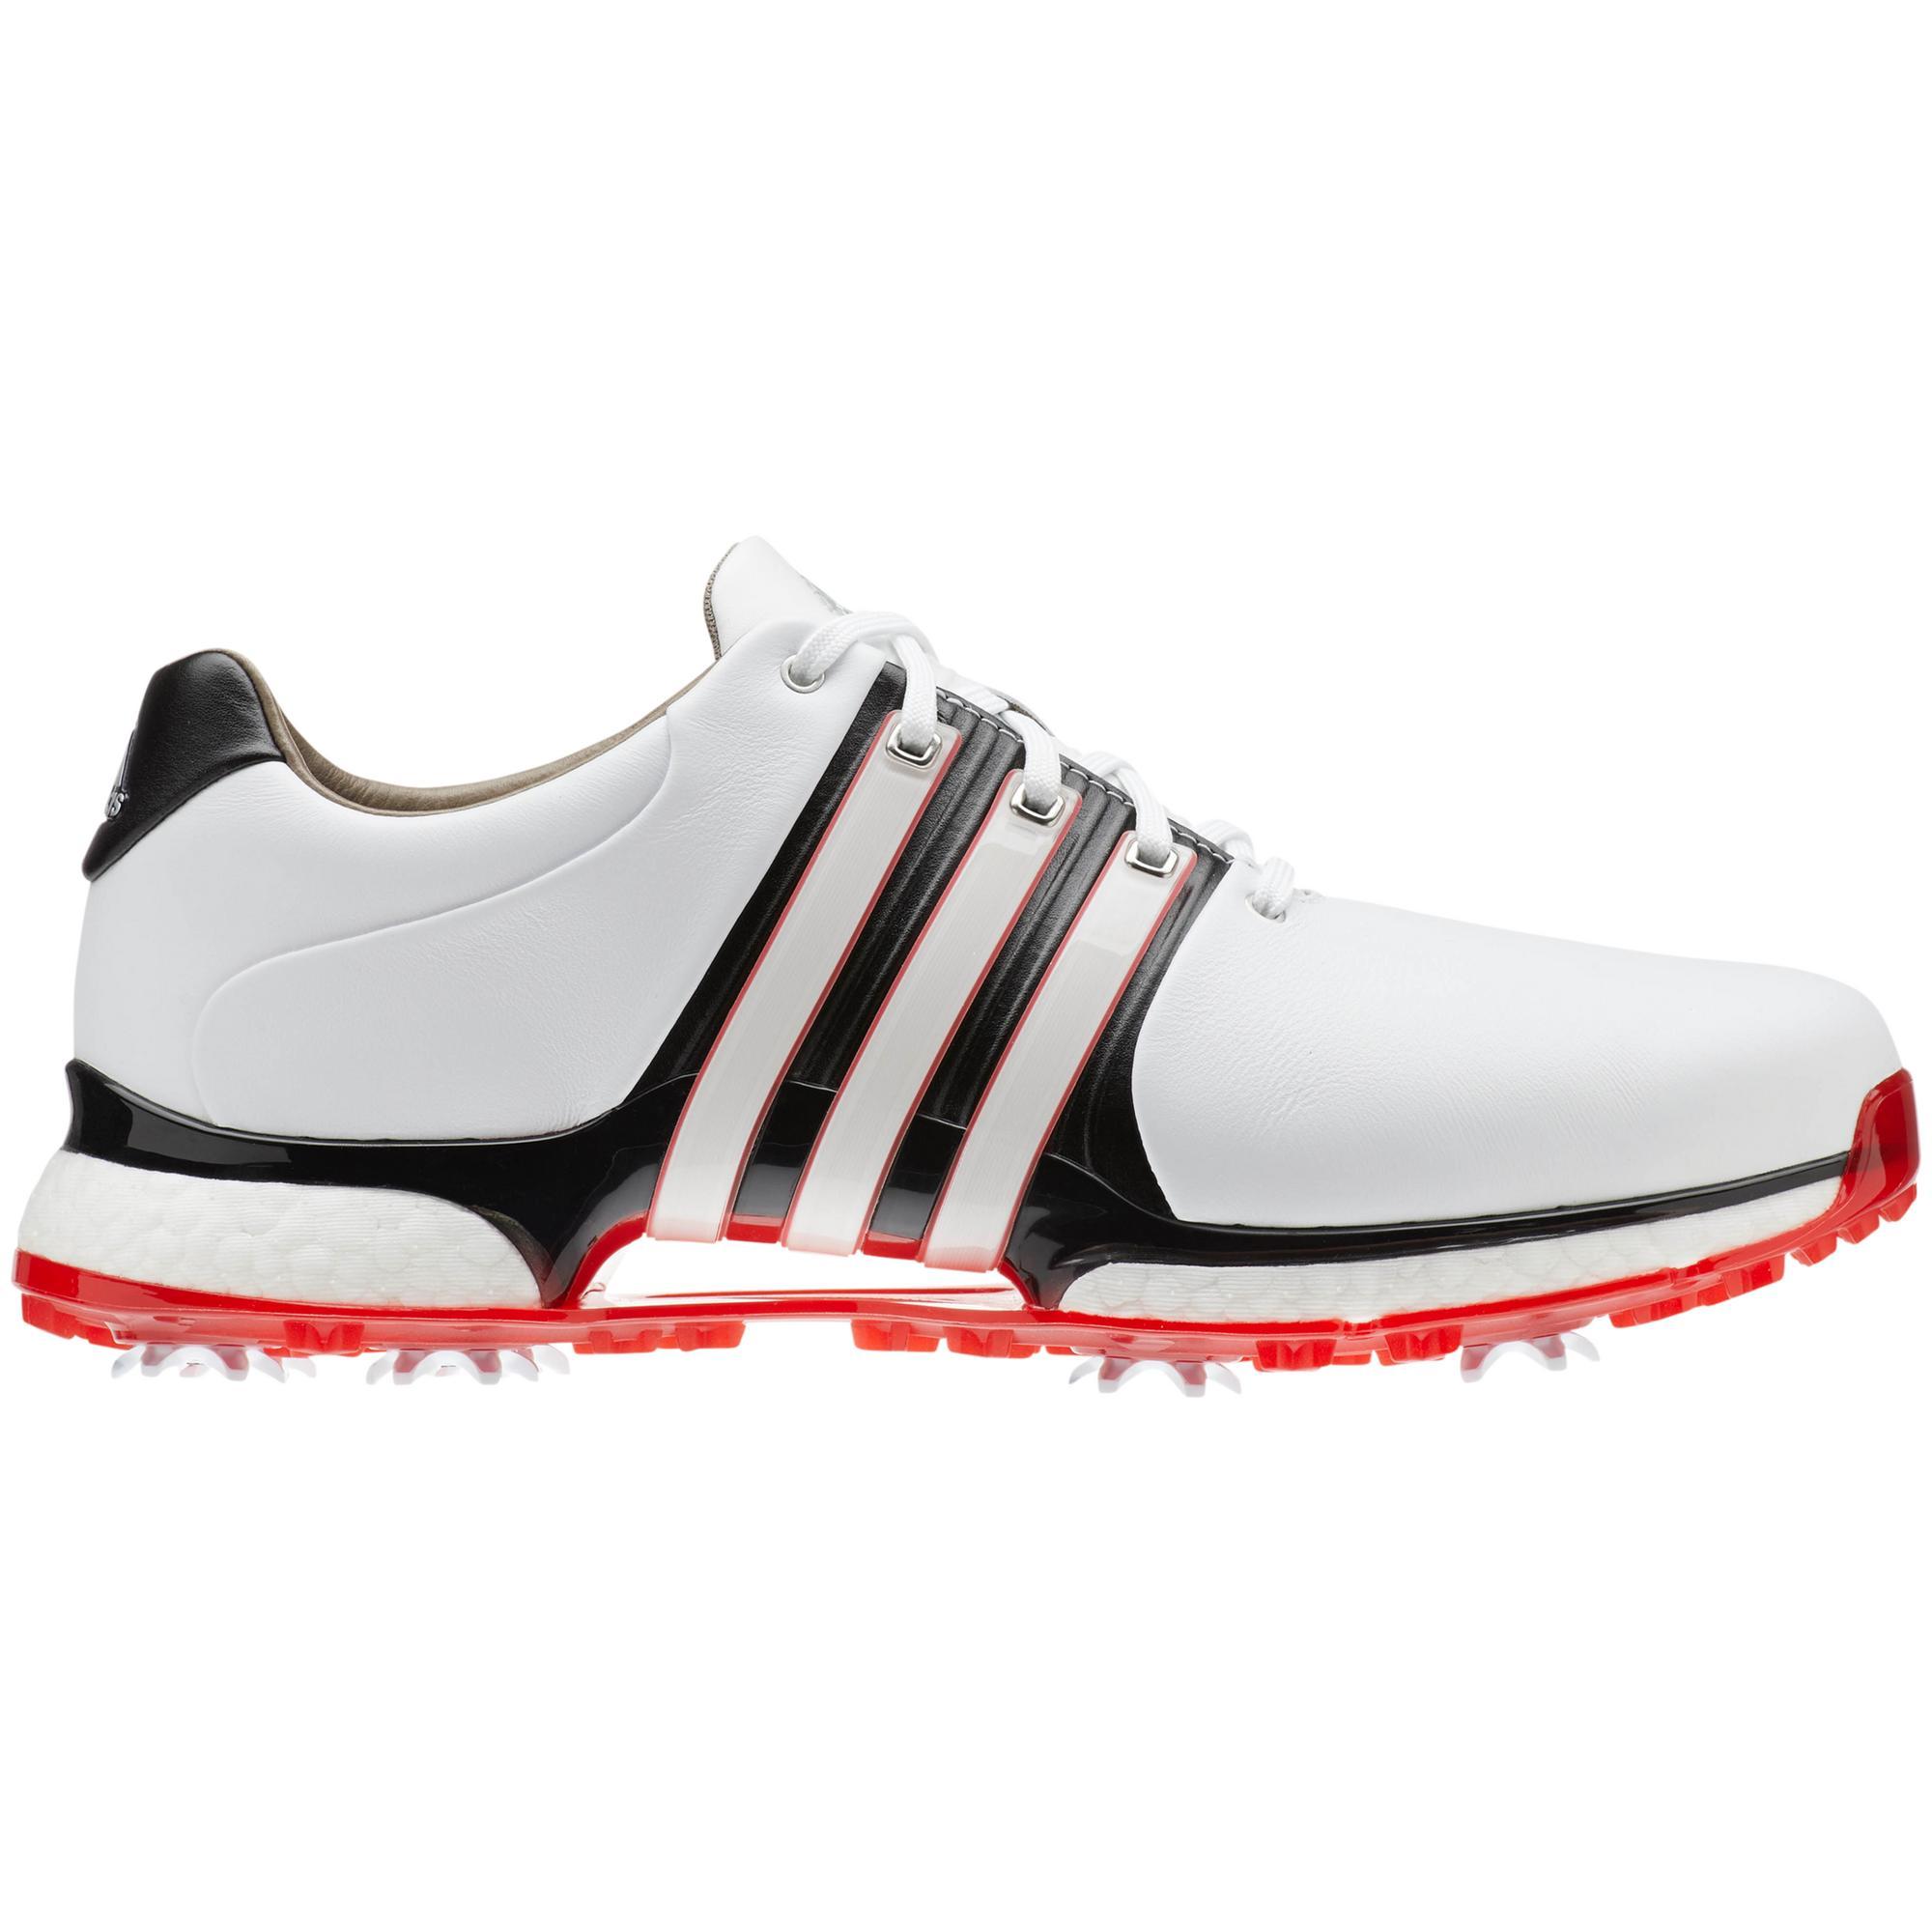 Men's Tour360 XT Spiked Golf Shoe - WHITE/BLACK/RED